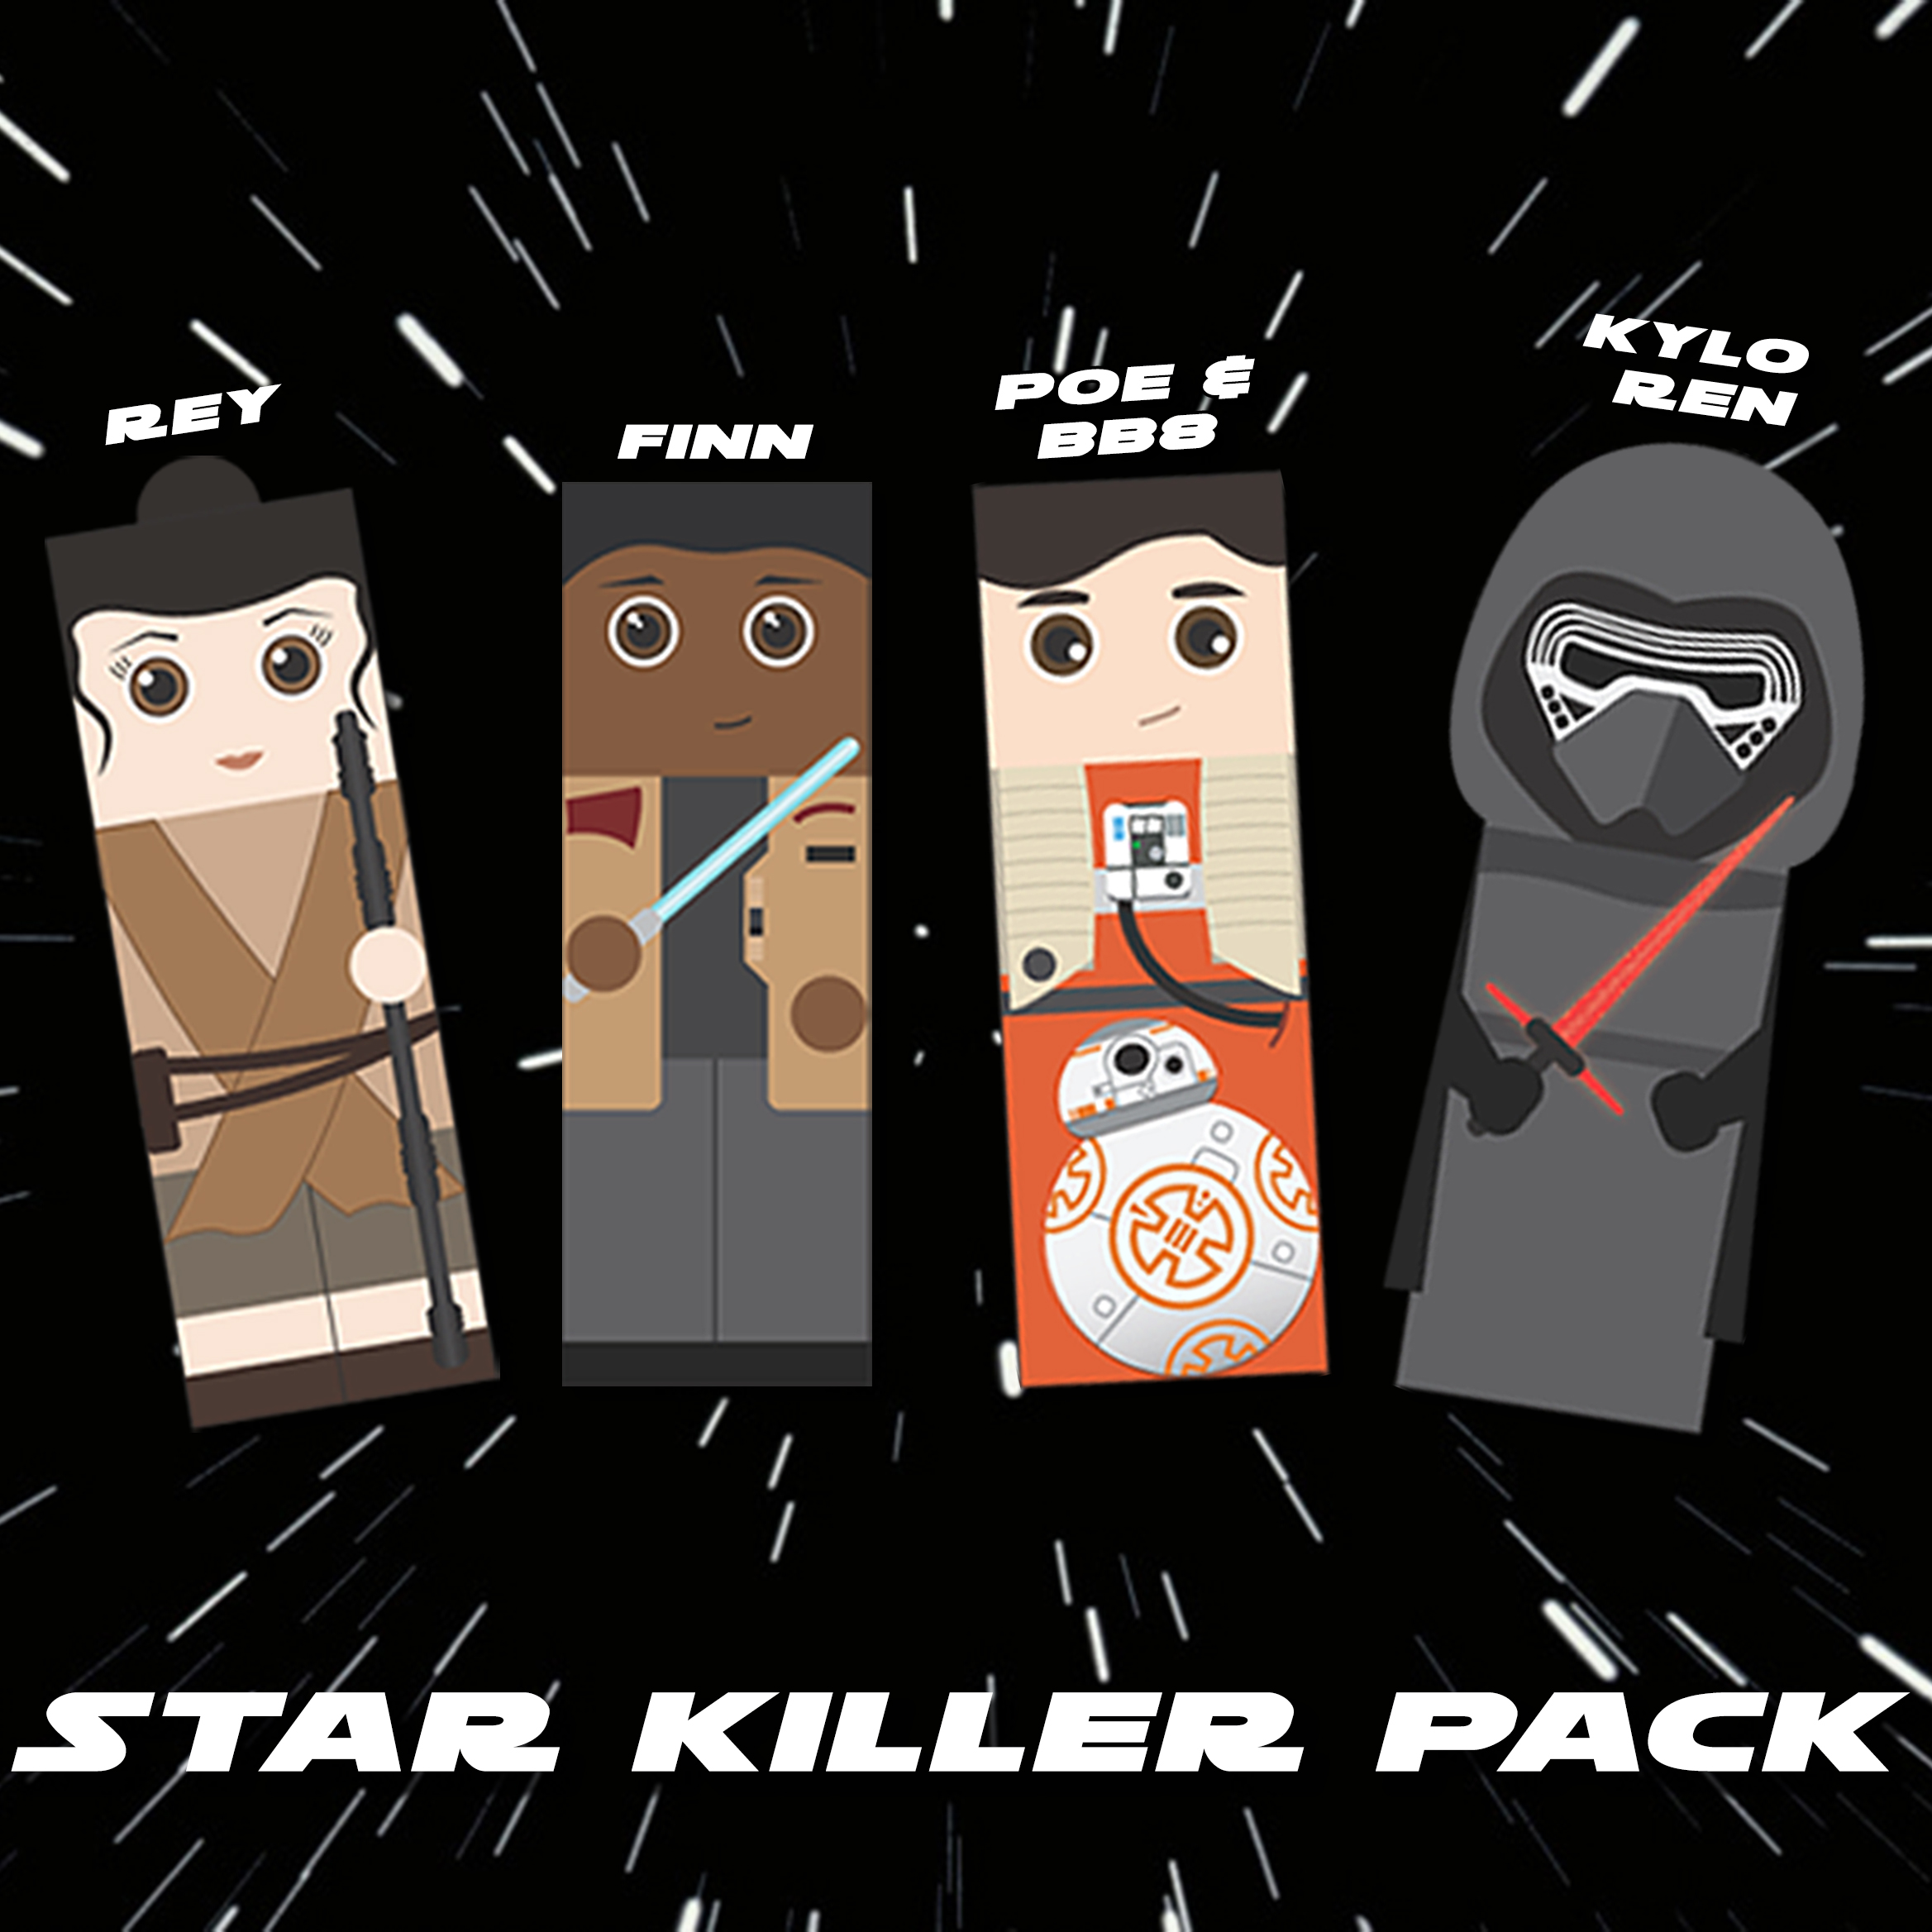 Star Wars Bookmarks_Star Killer Pack